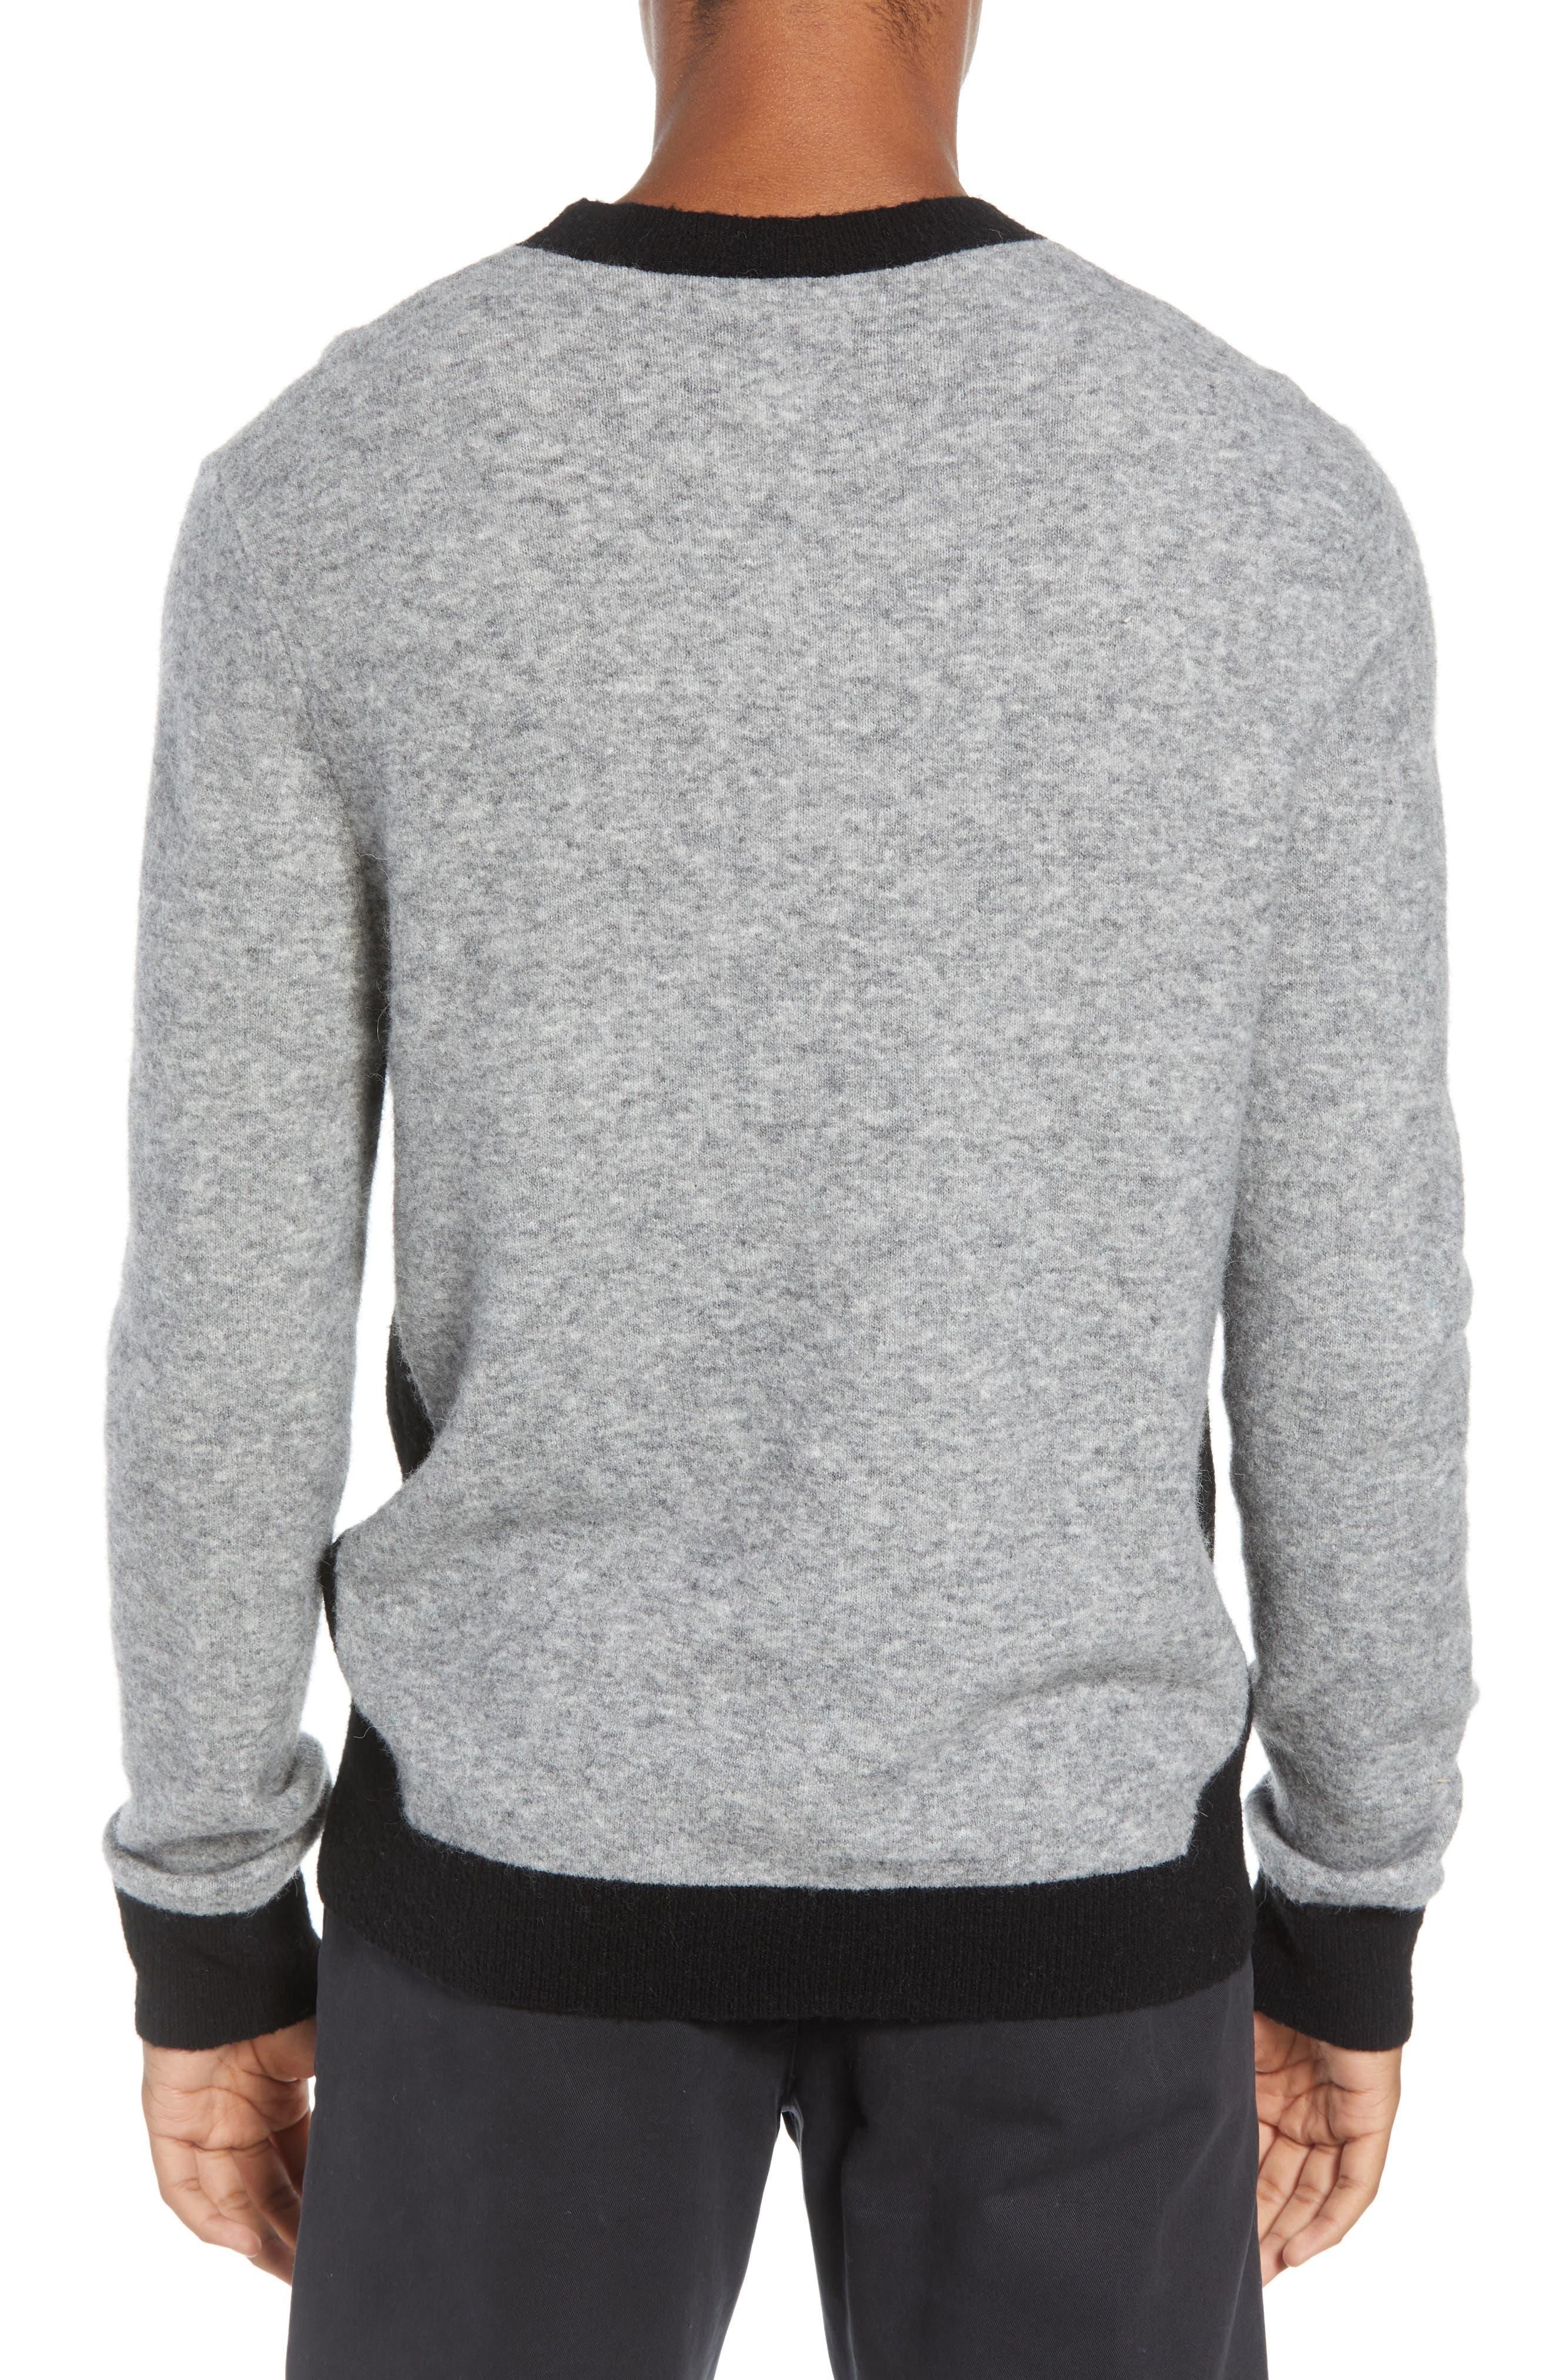 Clermont Slim Fit Crewneck Sweater,                             Alternate thumbnail 2, color,                             LIGHT HEATHER GREY